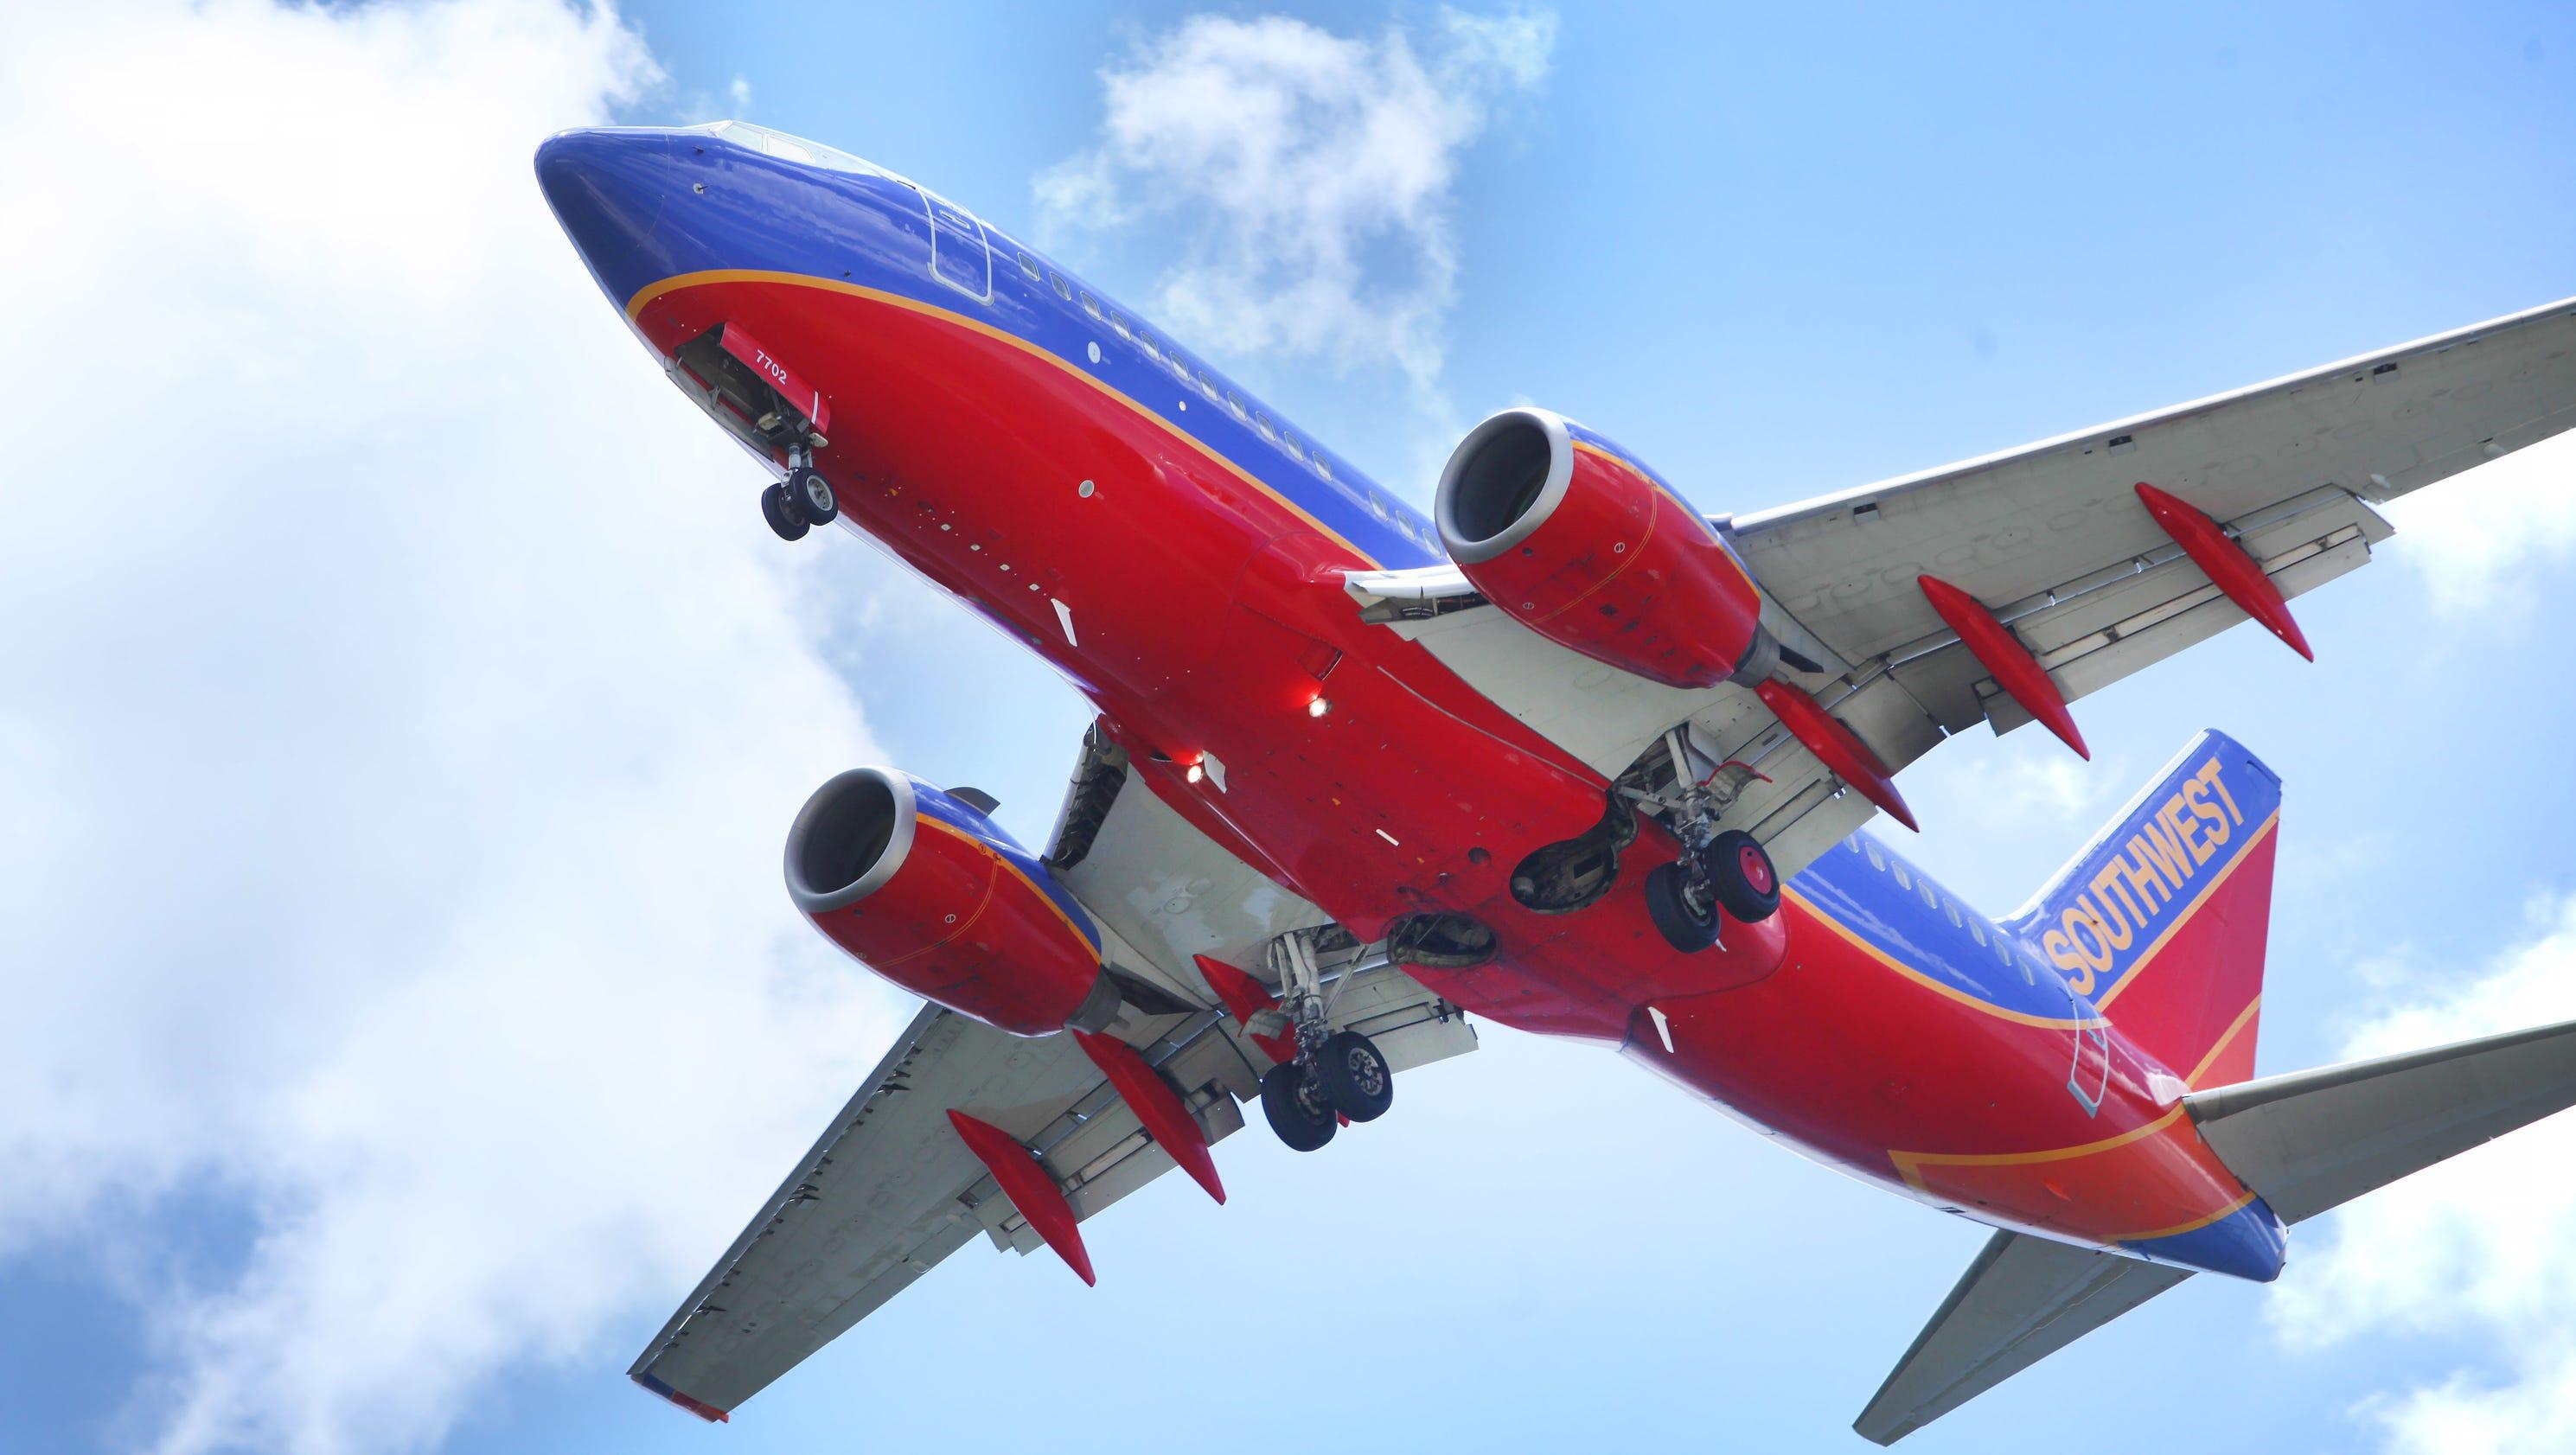 Soon landing at CVG: Southwest Airlines